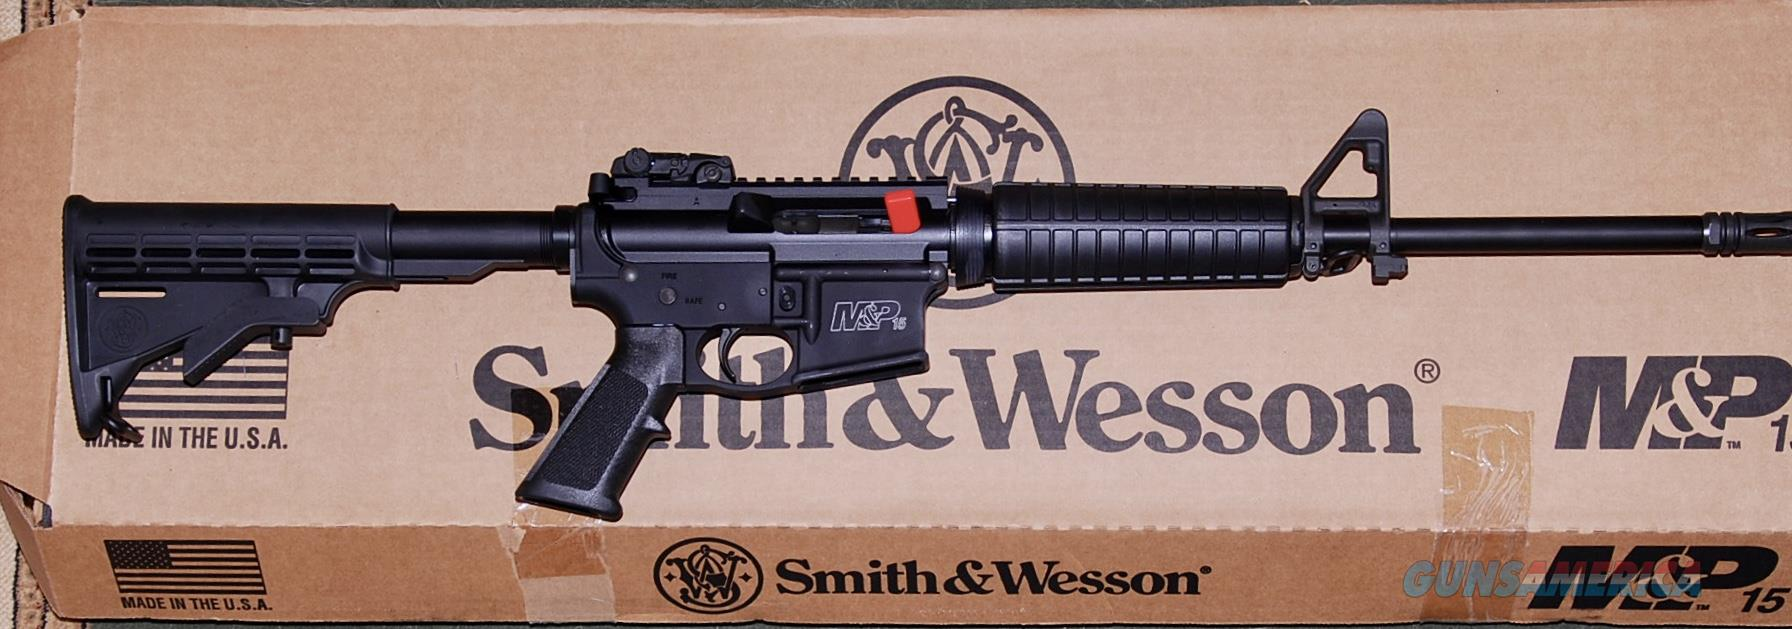 Smith & Wesson M&P 15 Sport  Guns > Rifles > Smith & Wesson Rifles > M&P